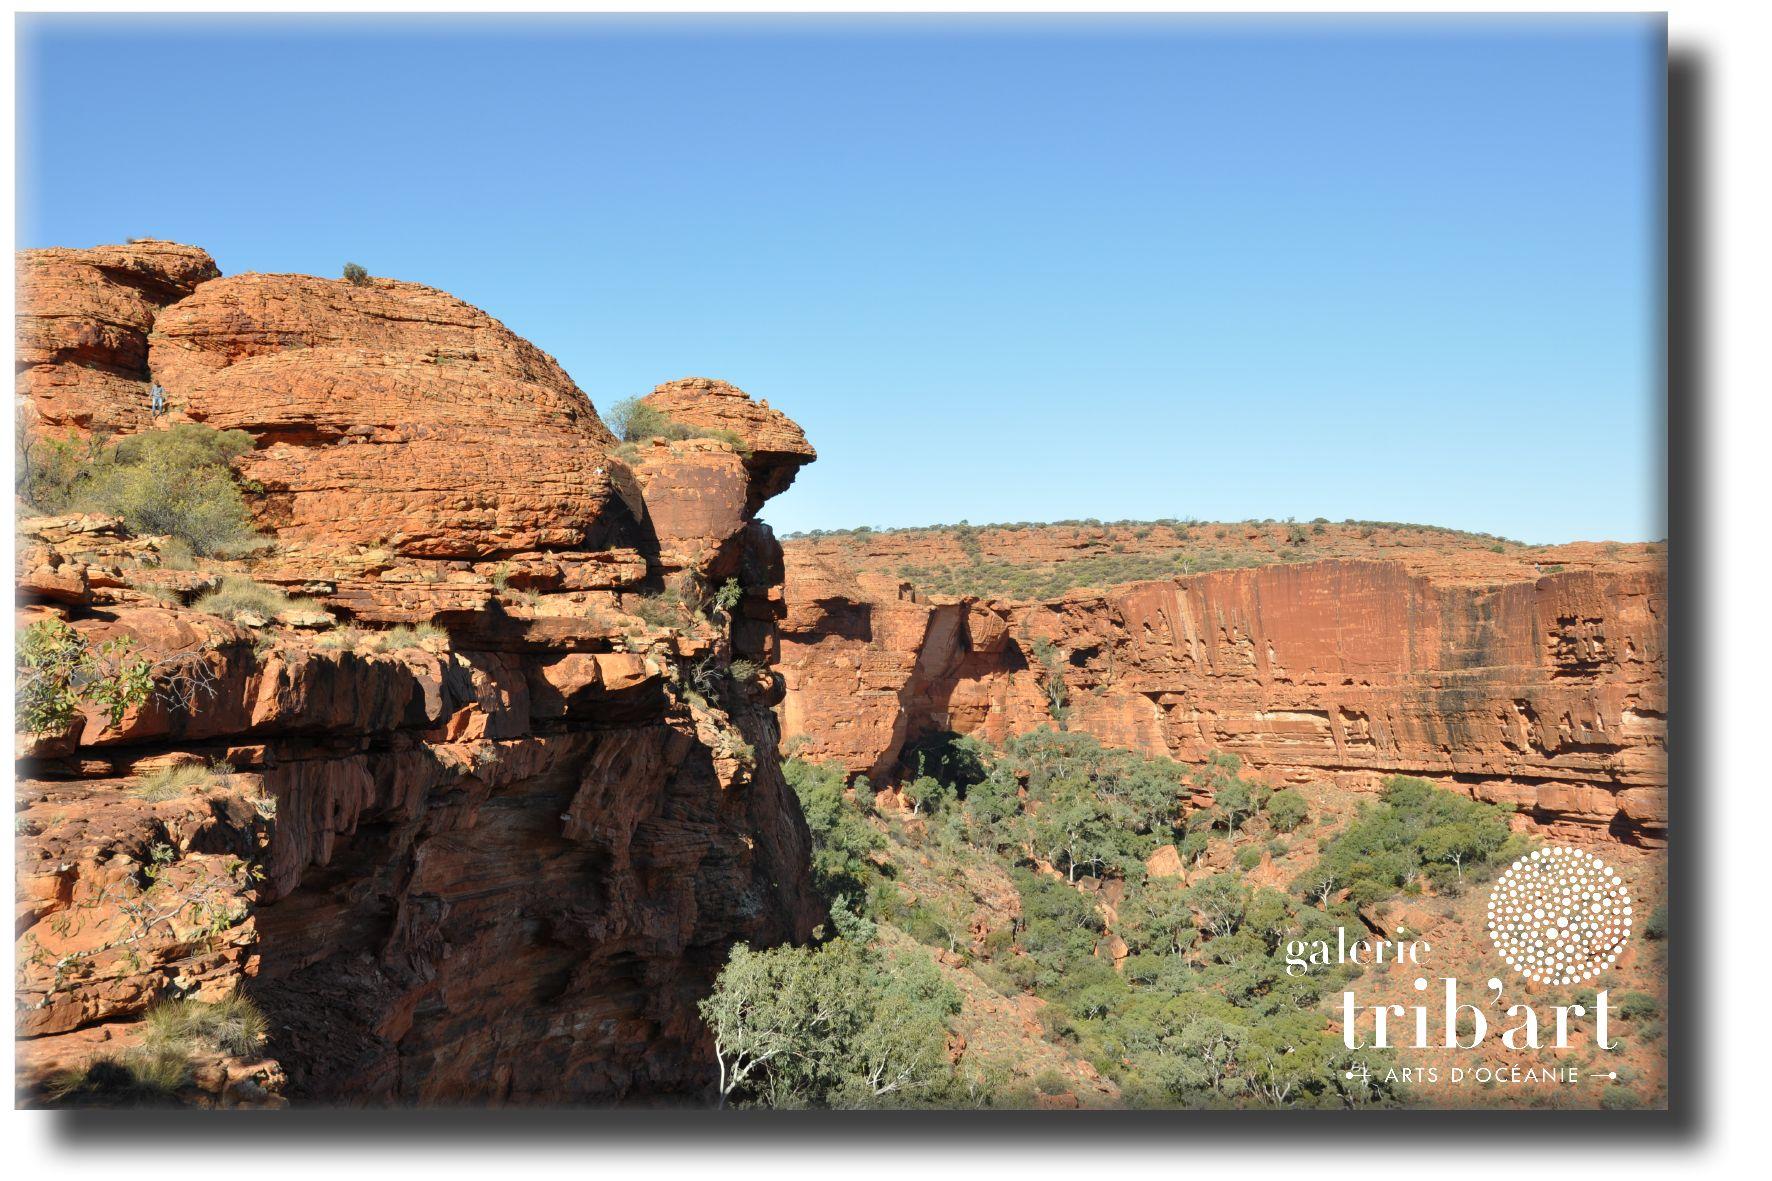 Kings Canyon (page 5)